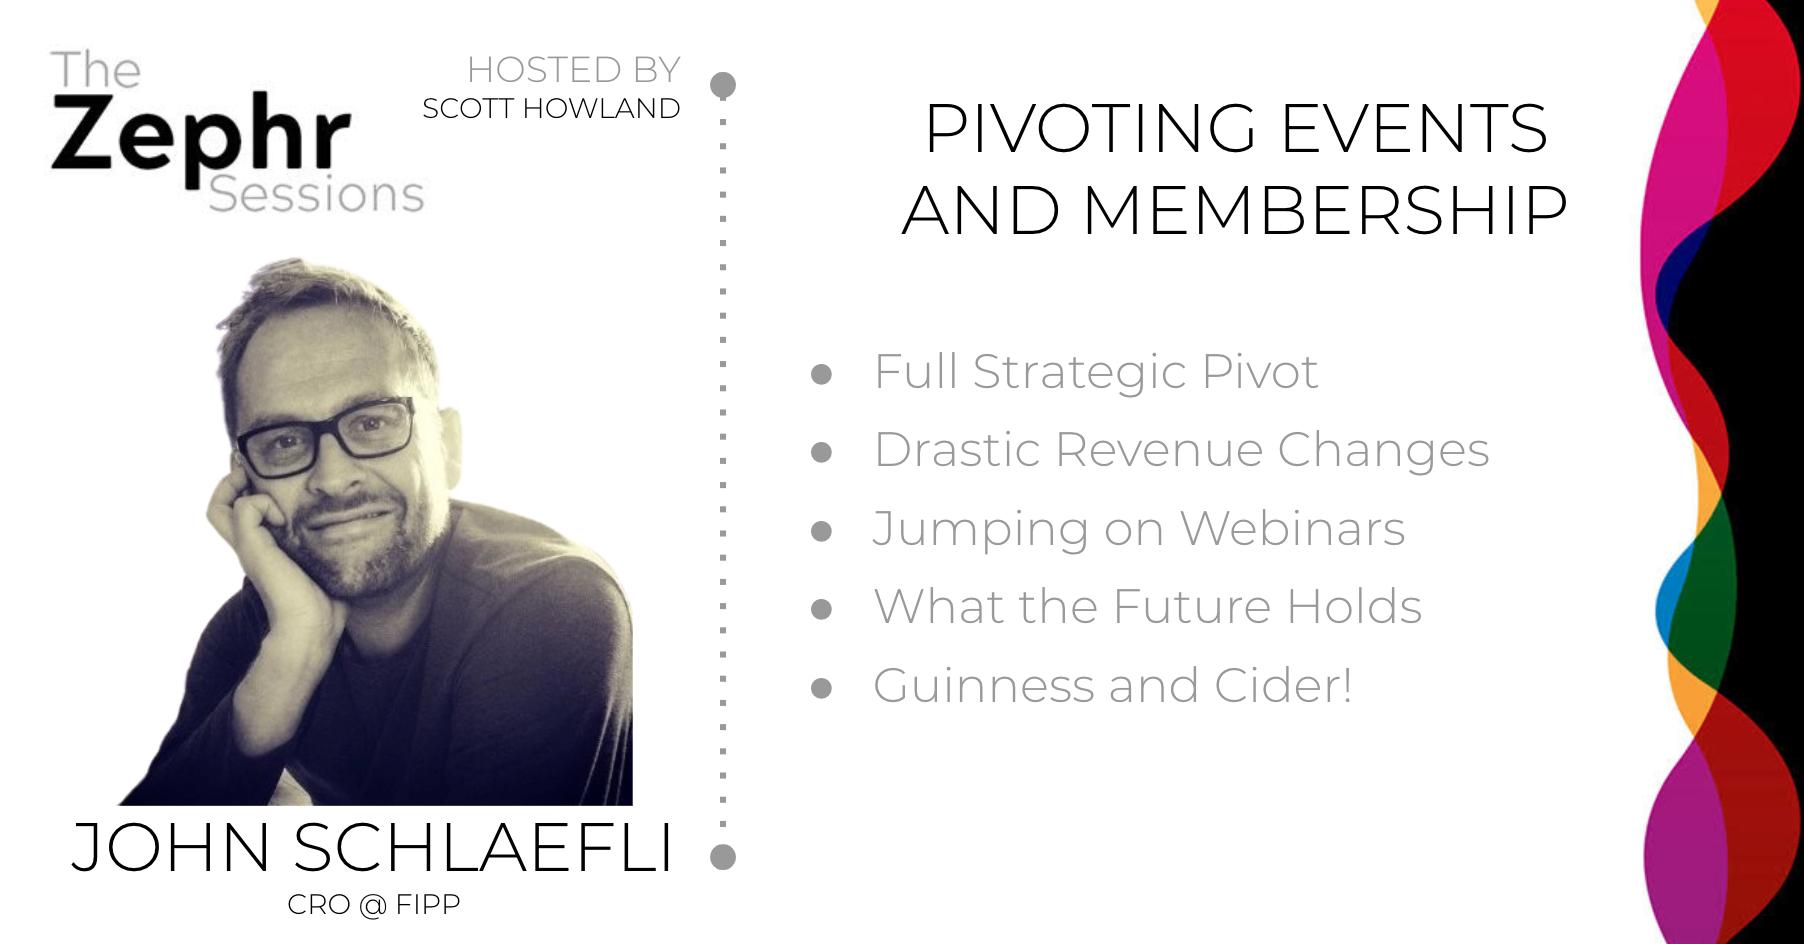 John Schlaefli FIPP Pivoting Revenues